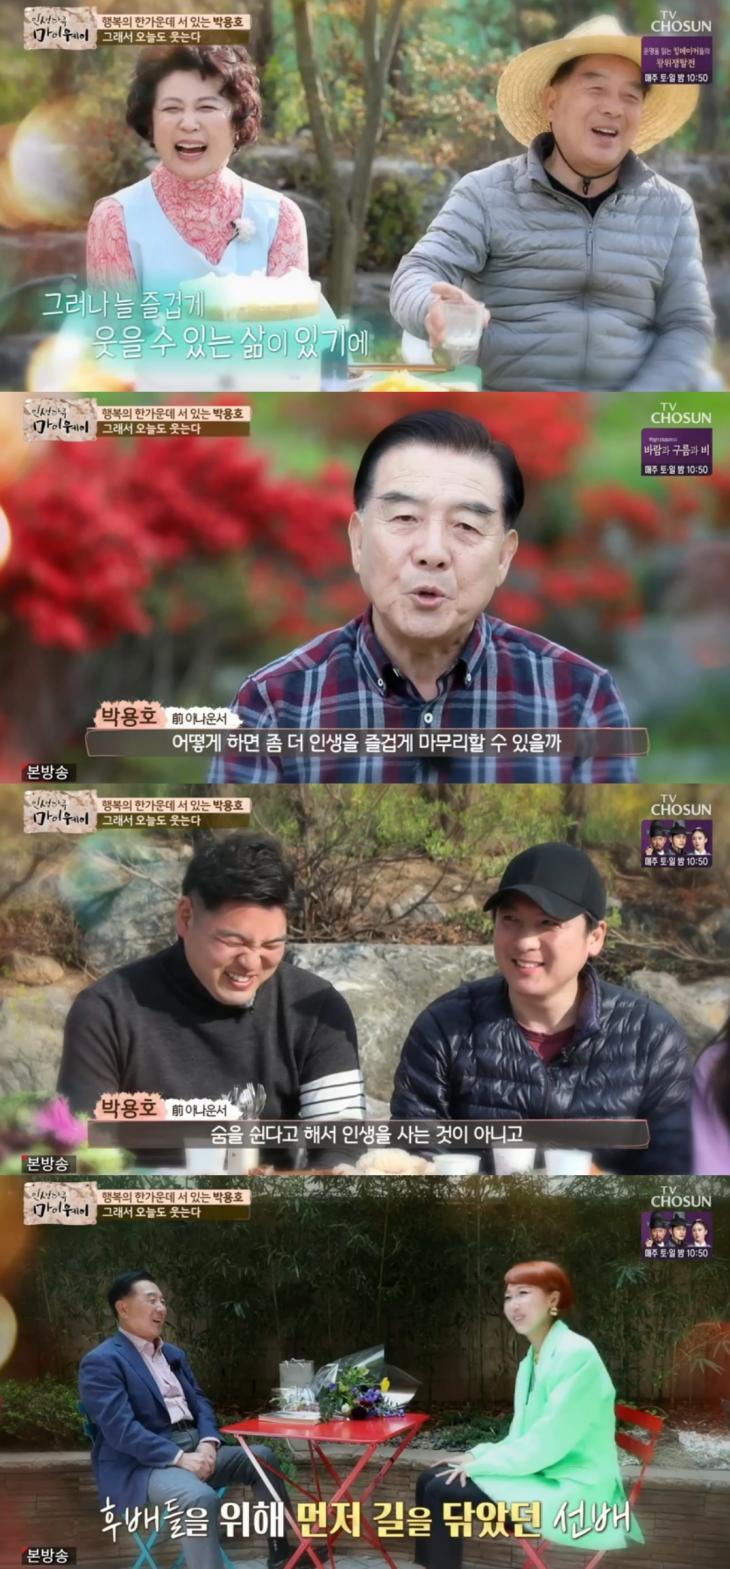 TV조선 시사교양 프로그램 '인생다큐 마이웨이'